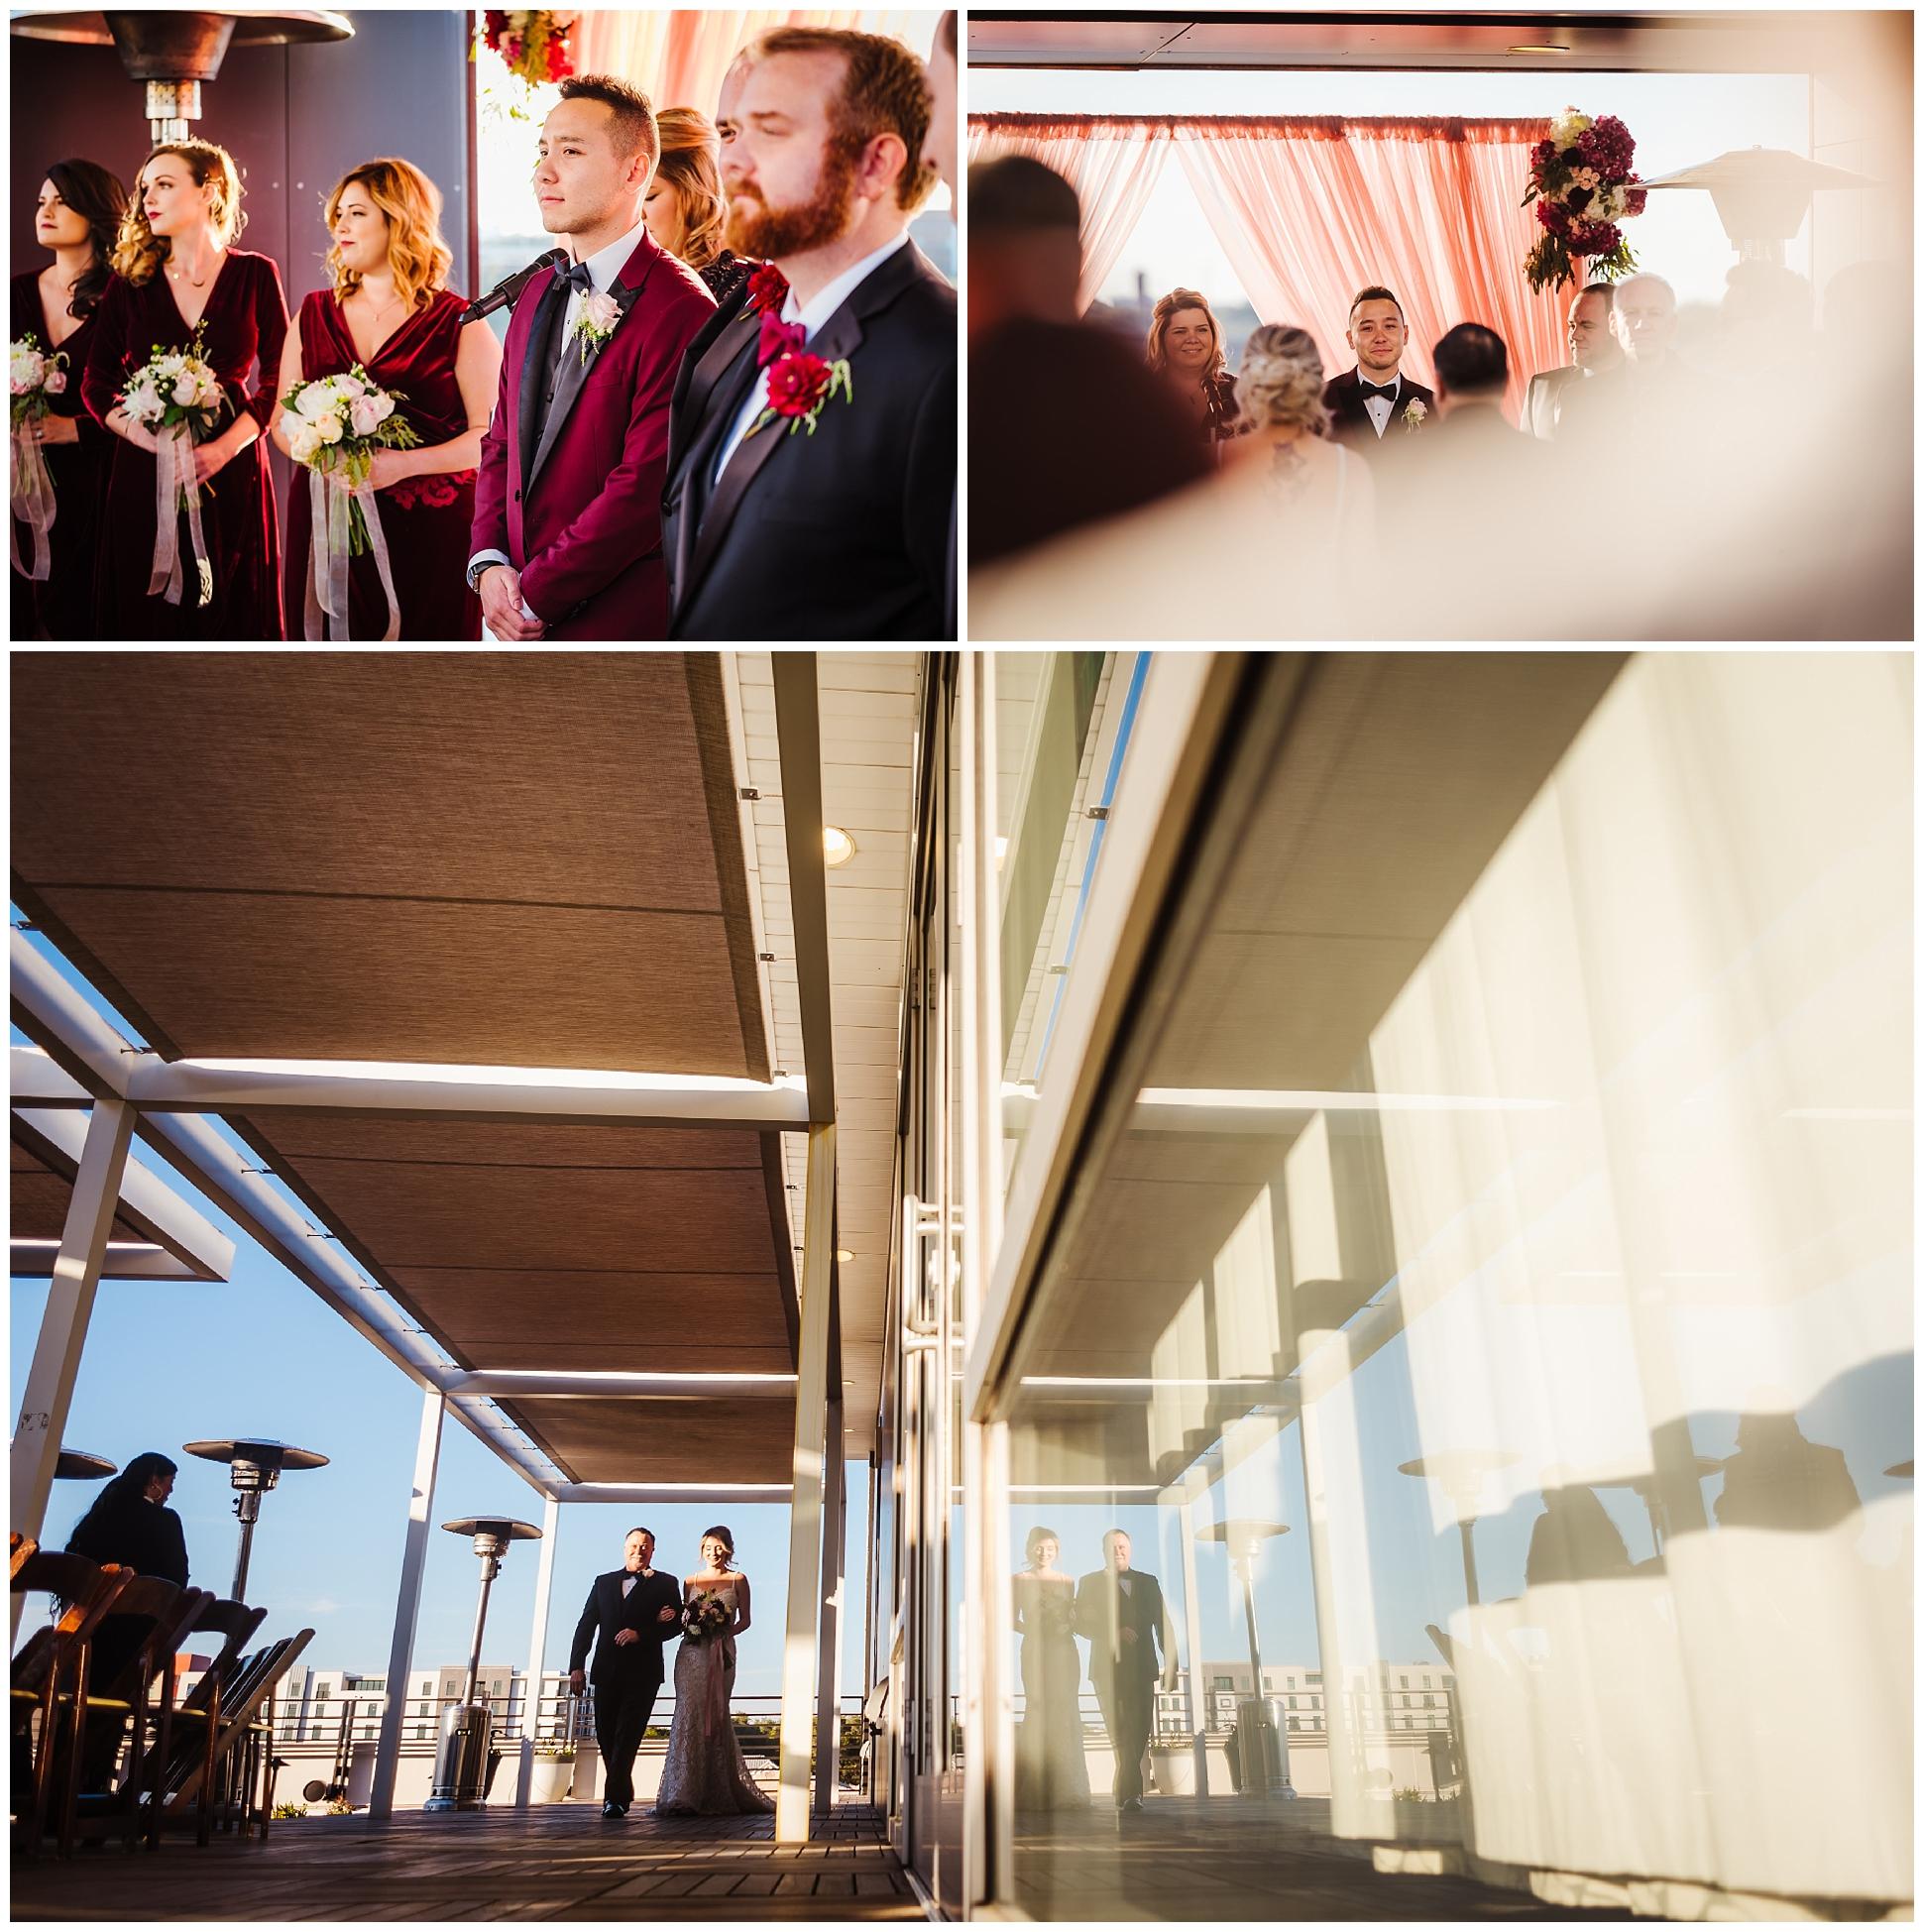 tampa-armeture-wedding-photographer-edgy-industrial-downtown-fancy-free-nursery-tattoo-burgandy-velvet_0045.jpg